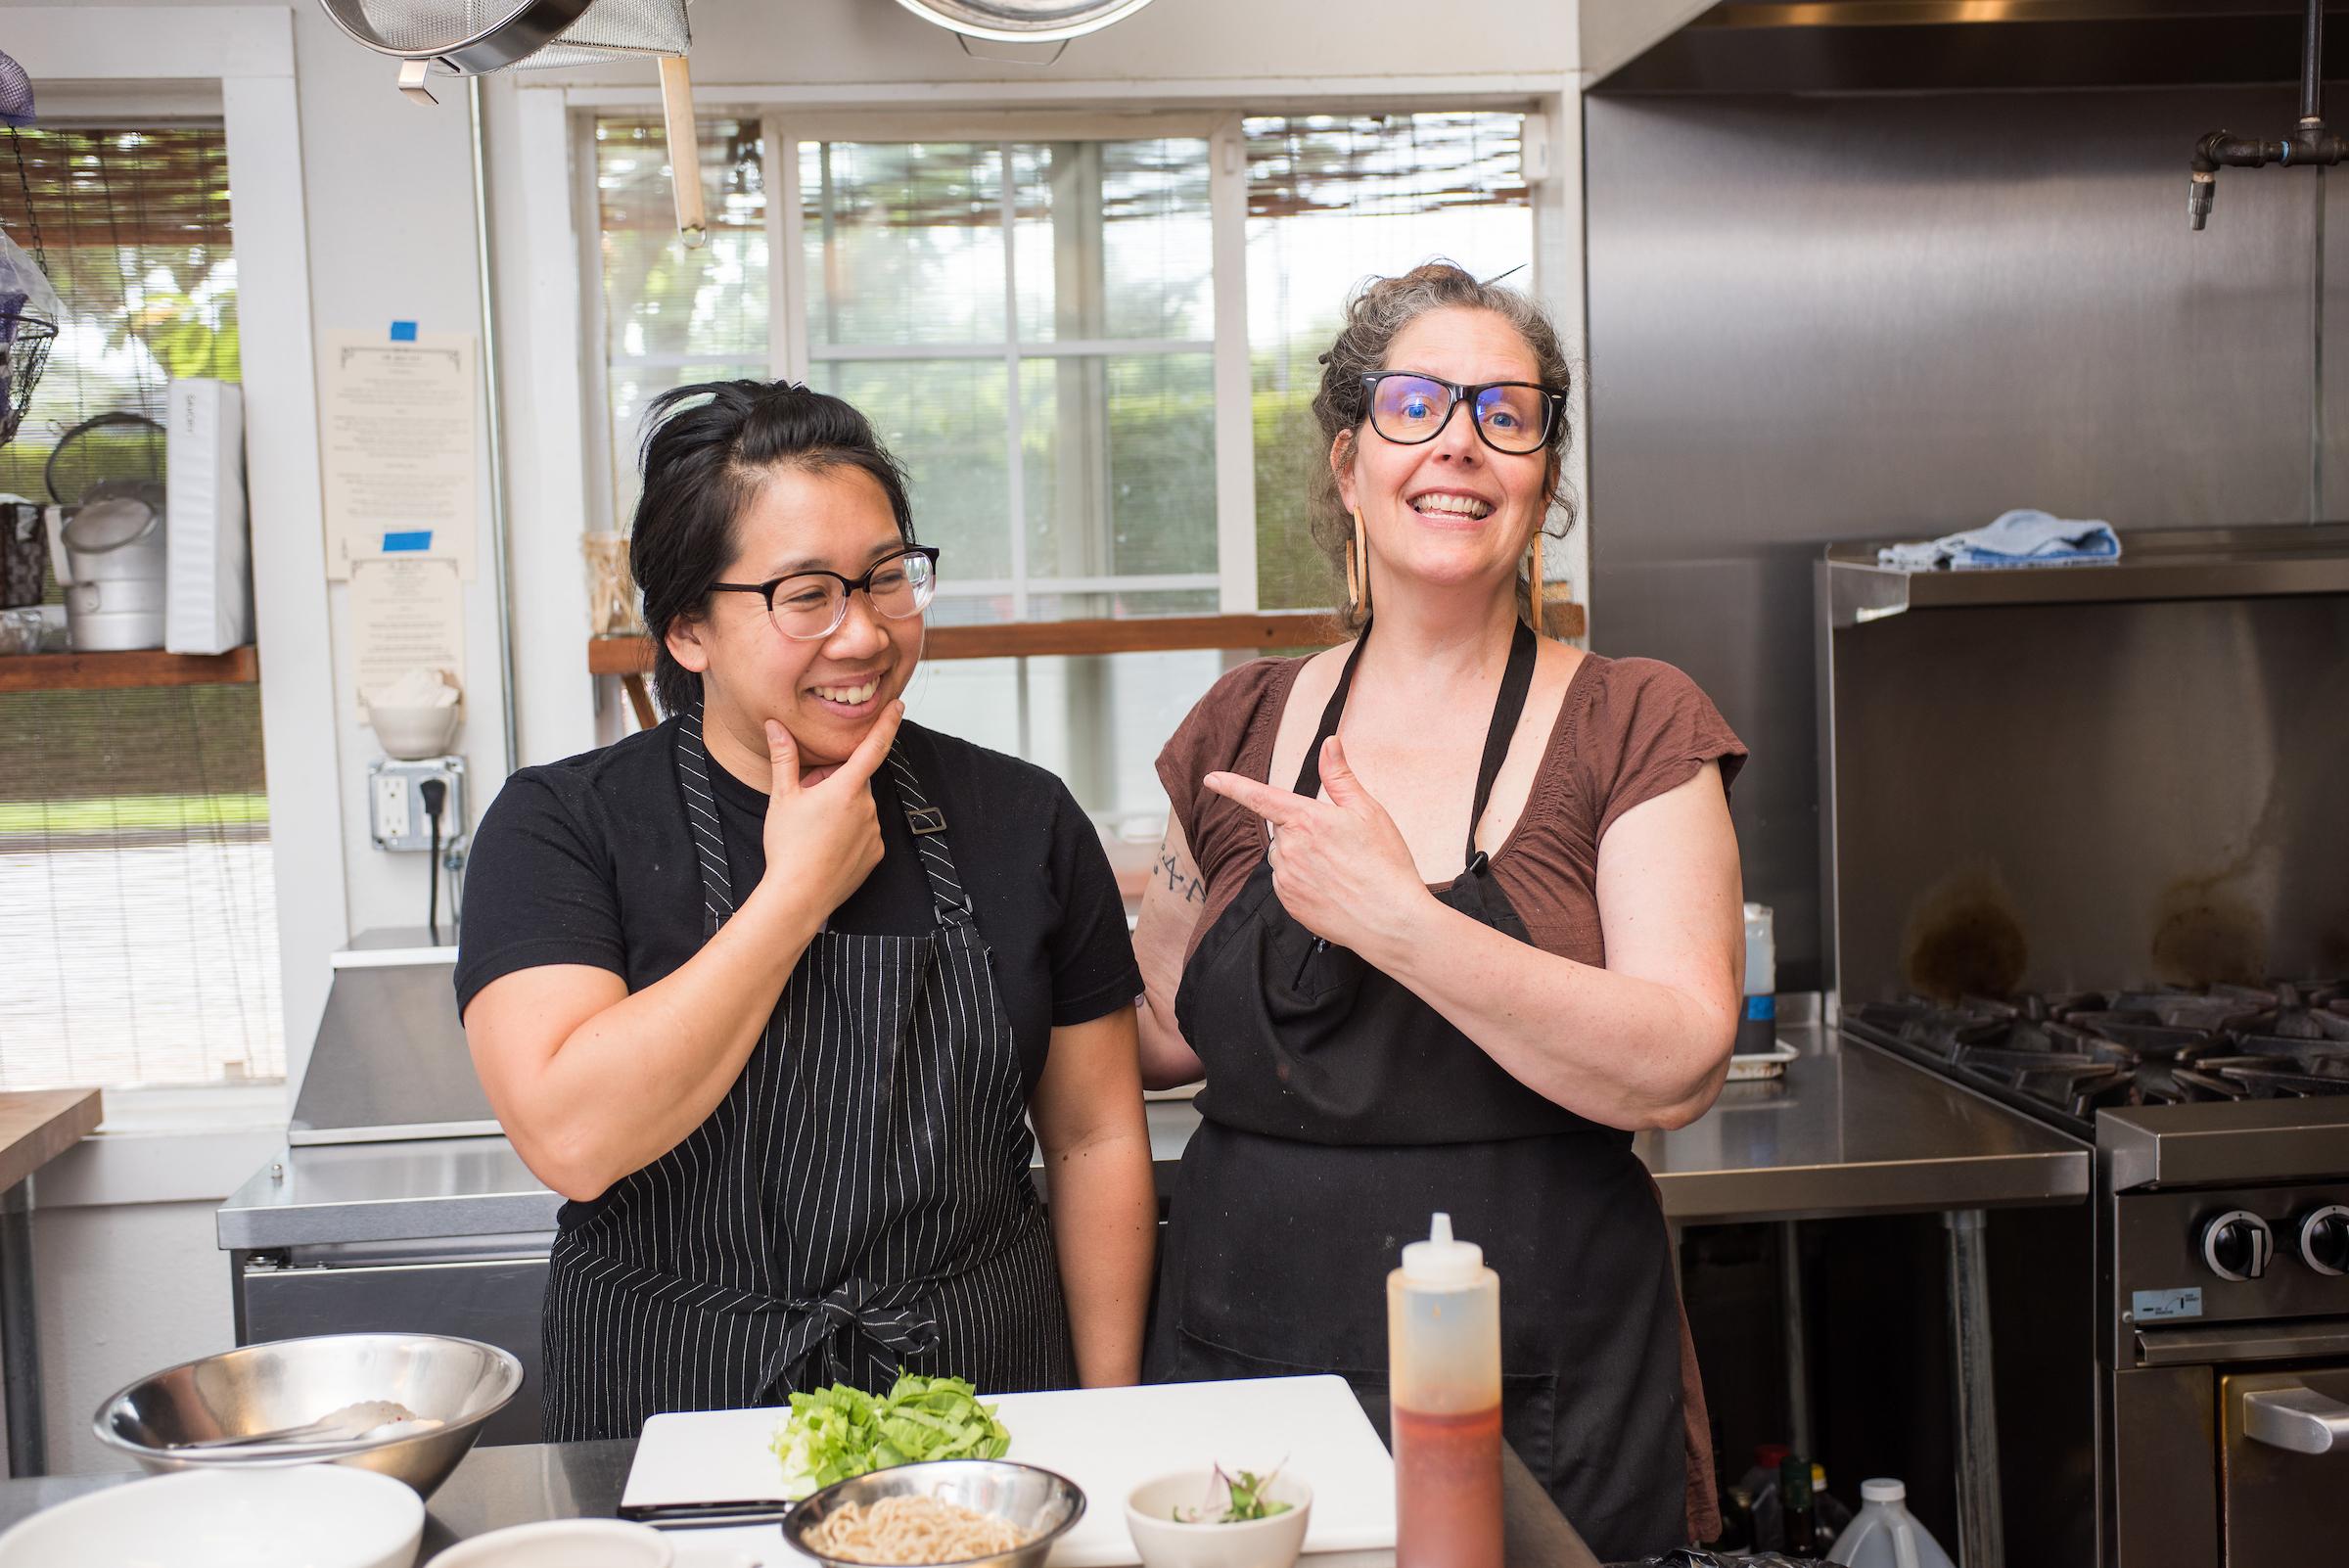 Nancye Benson and Jane Hashimawari, Co-Owners of Milk Glass Market in Portland, Oregon.